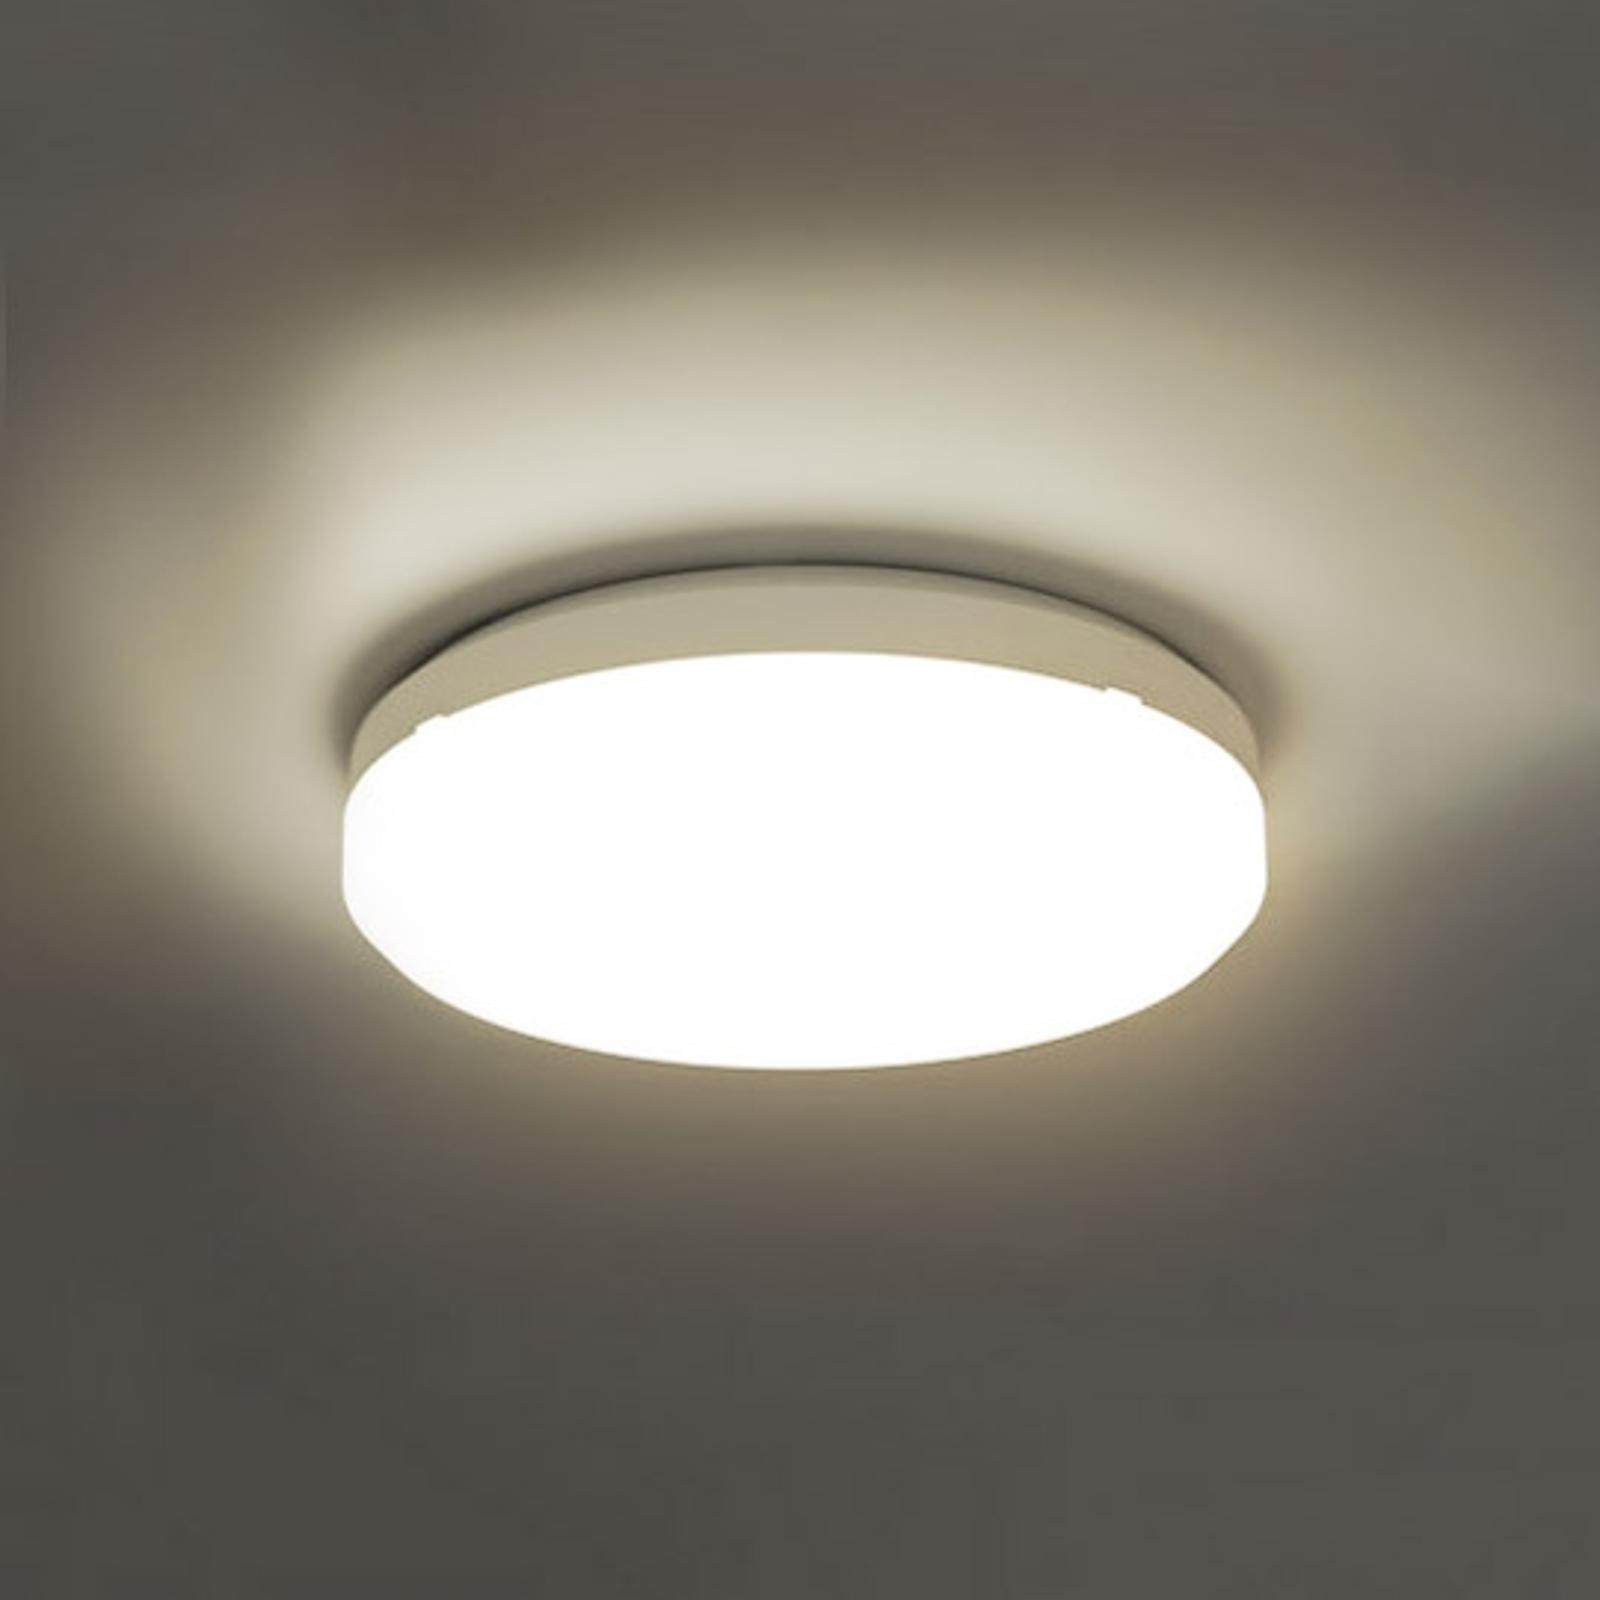 Sun 15 - lampada LED IP65, 18 W 3000K ww